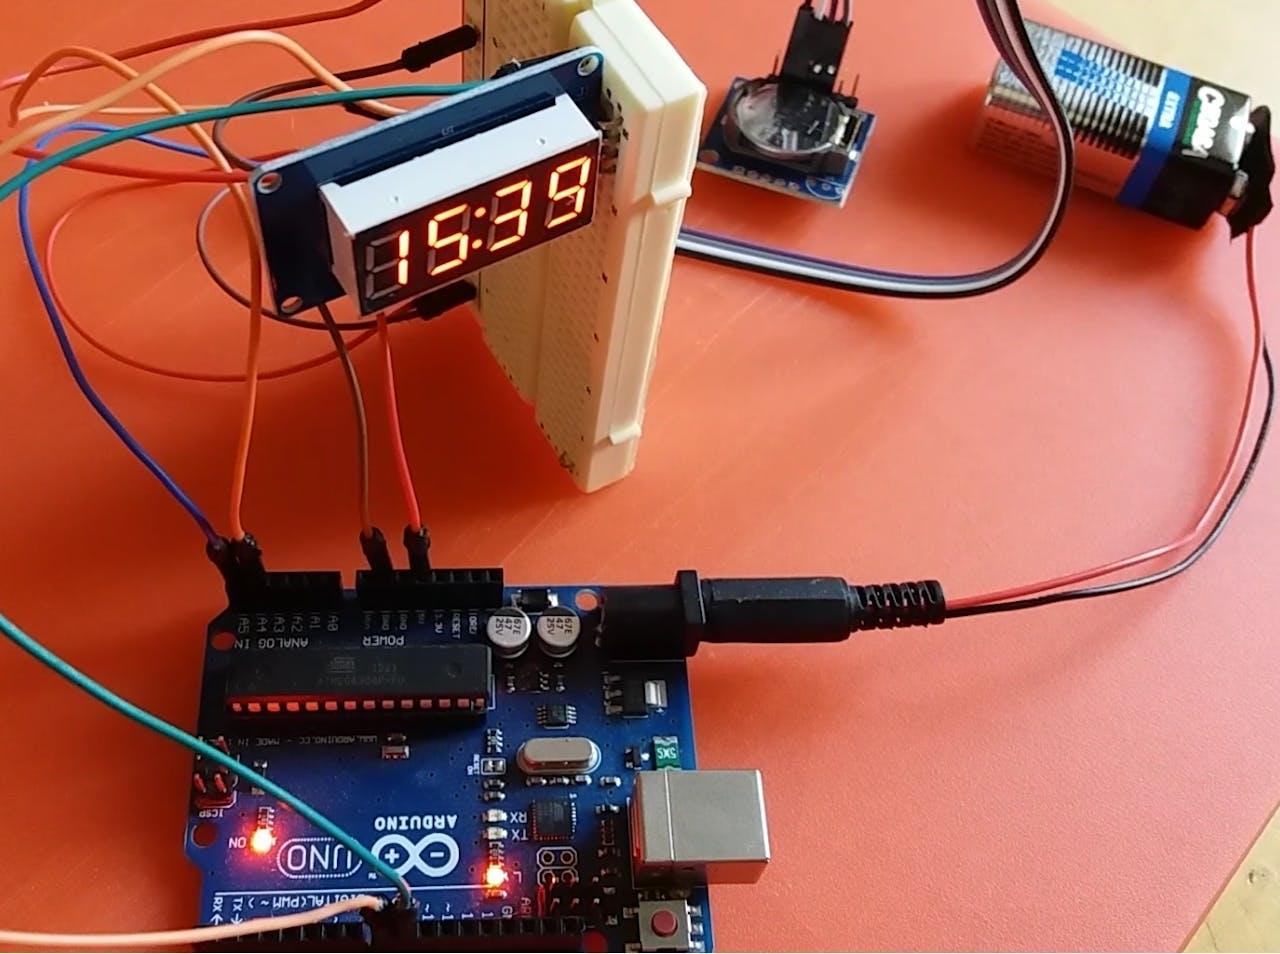 4 Digit Rtc Clock Arduino Project Hub Http Wwwschematicdiagramcom Electronicdigitalclockhtml